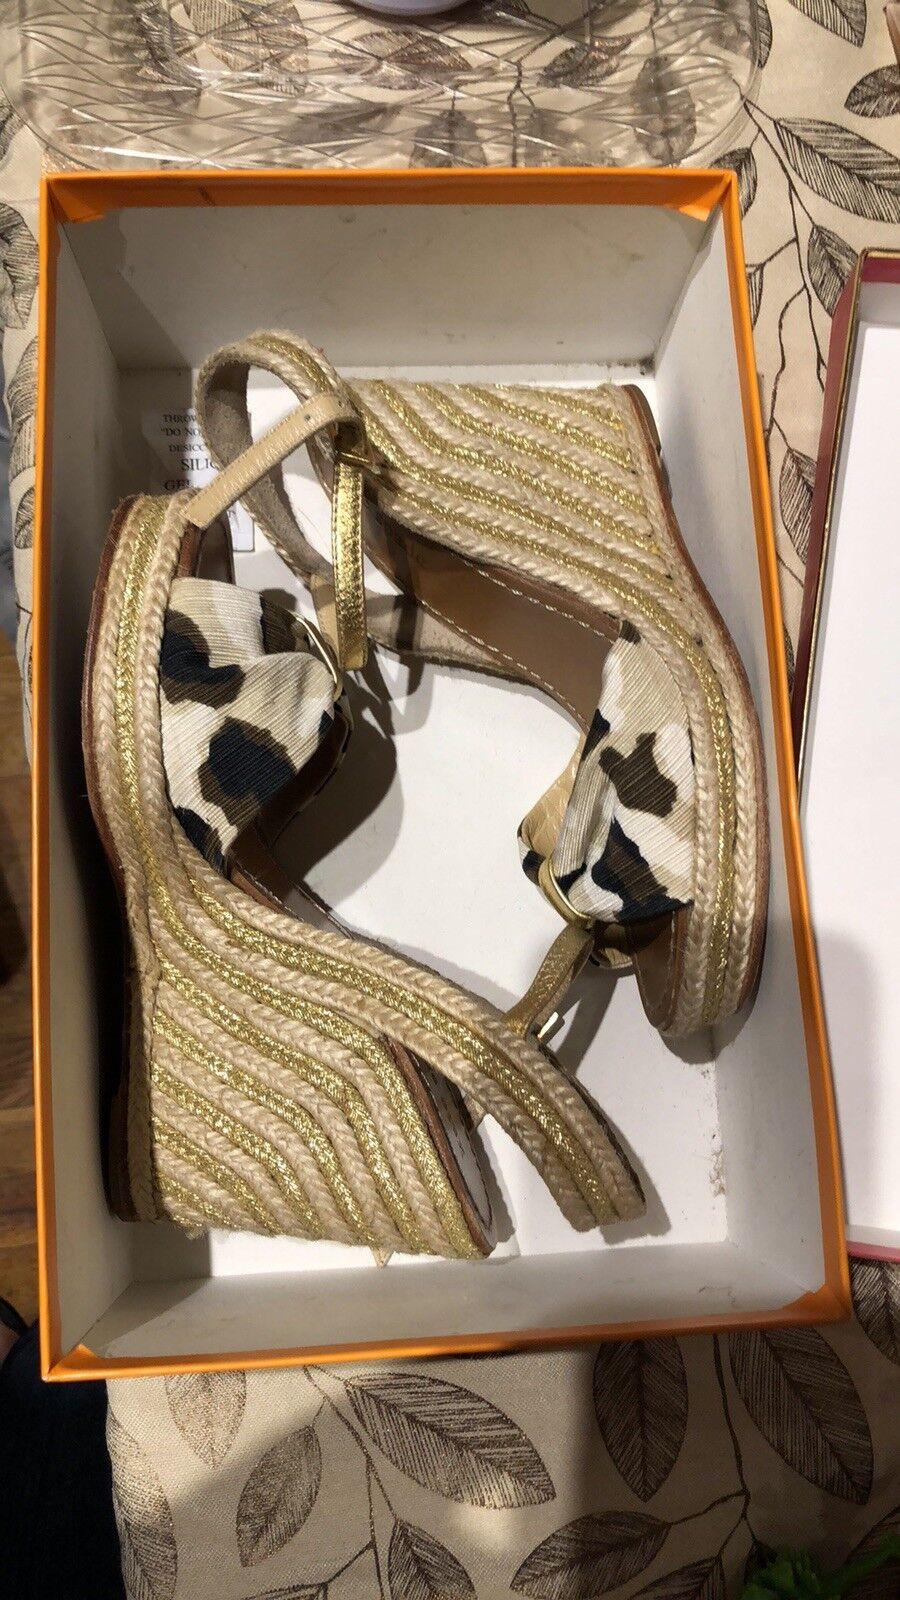 kate spade shoes 6 - image 6